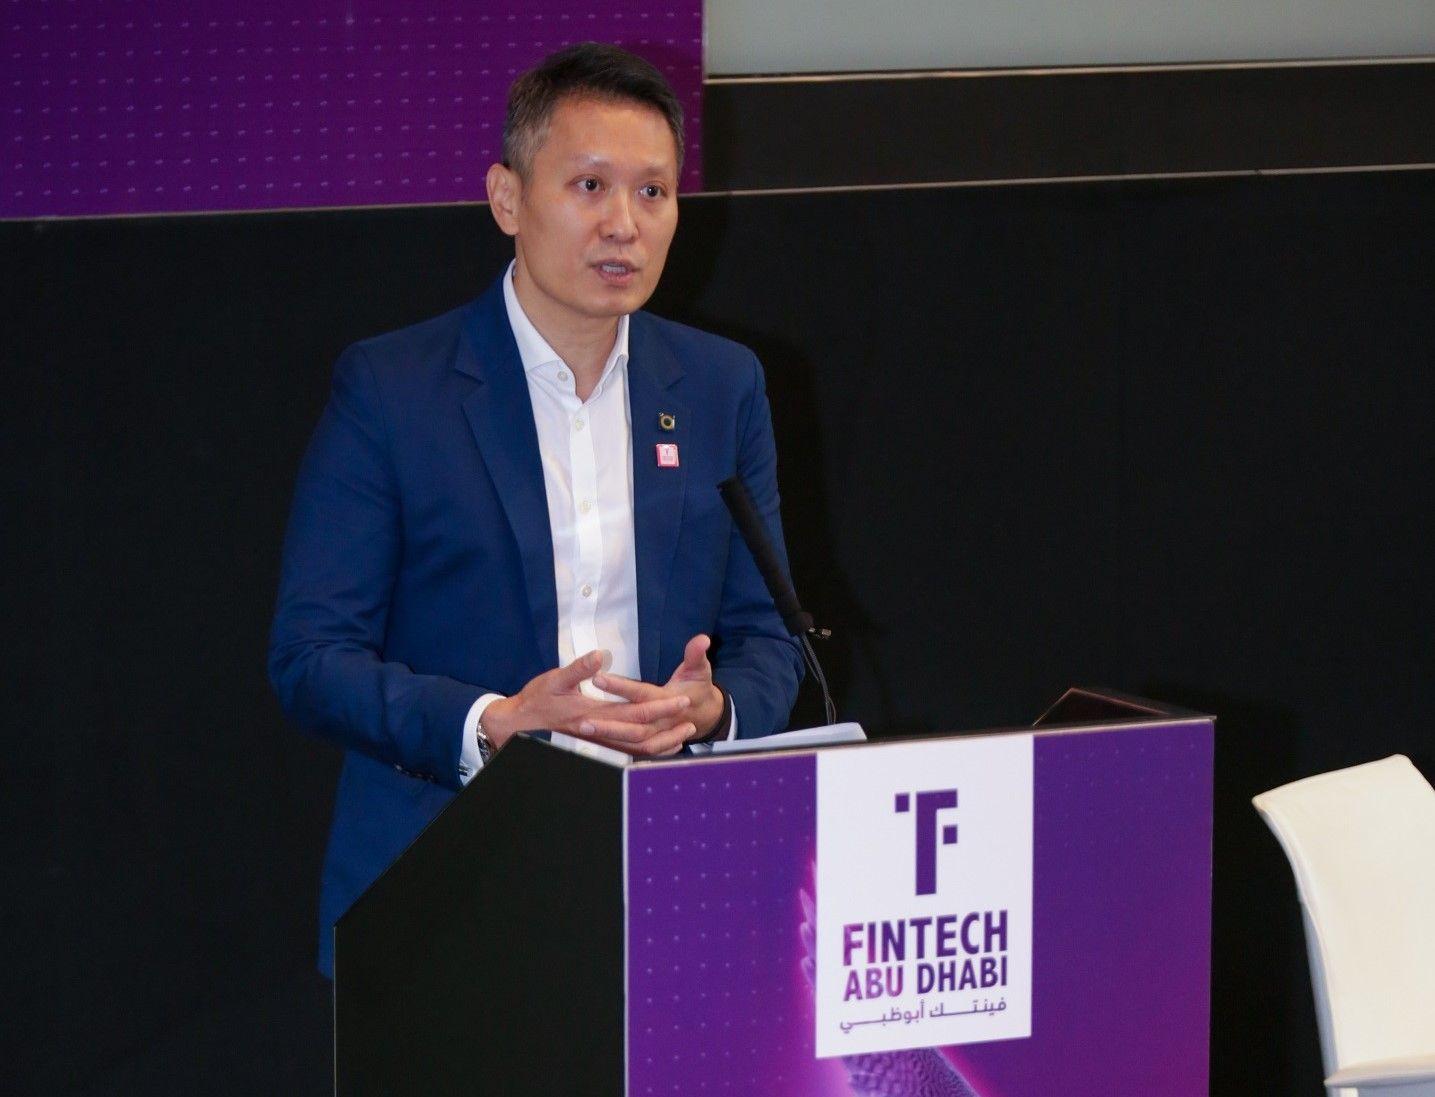 Regulatory environment biggest hurdle facing fintech startups